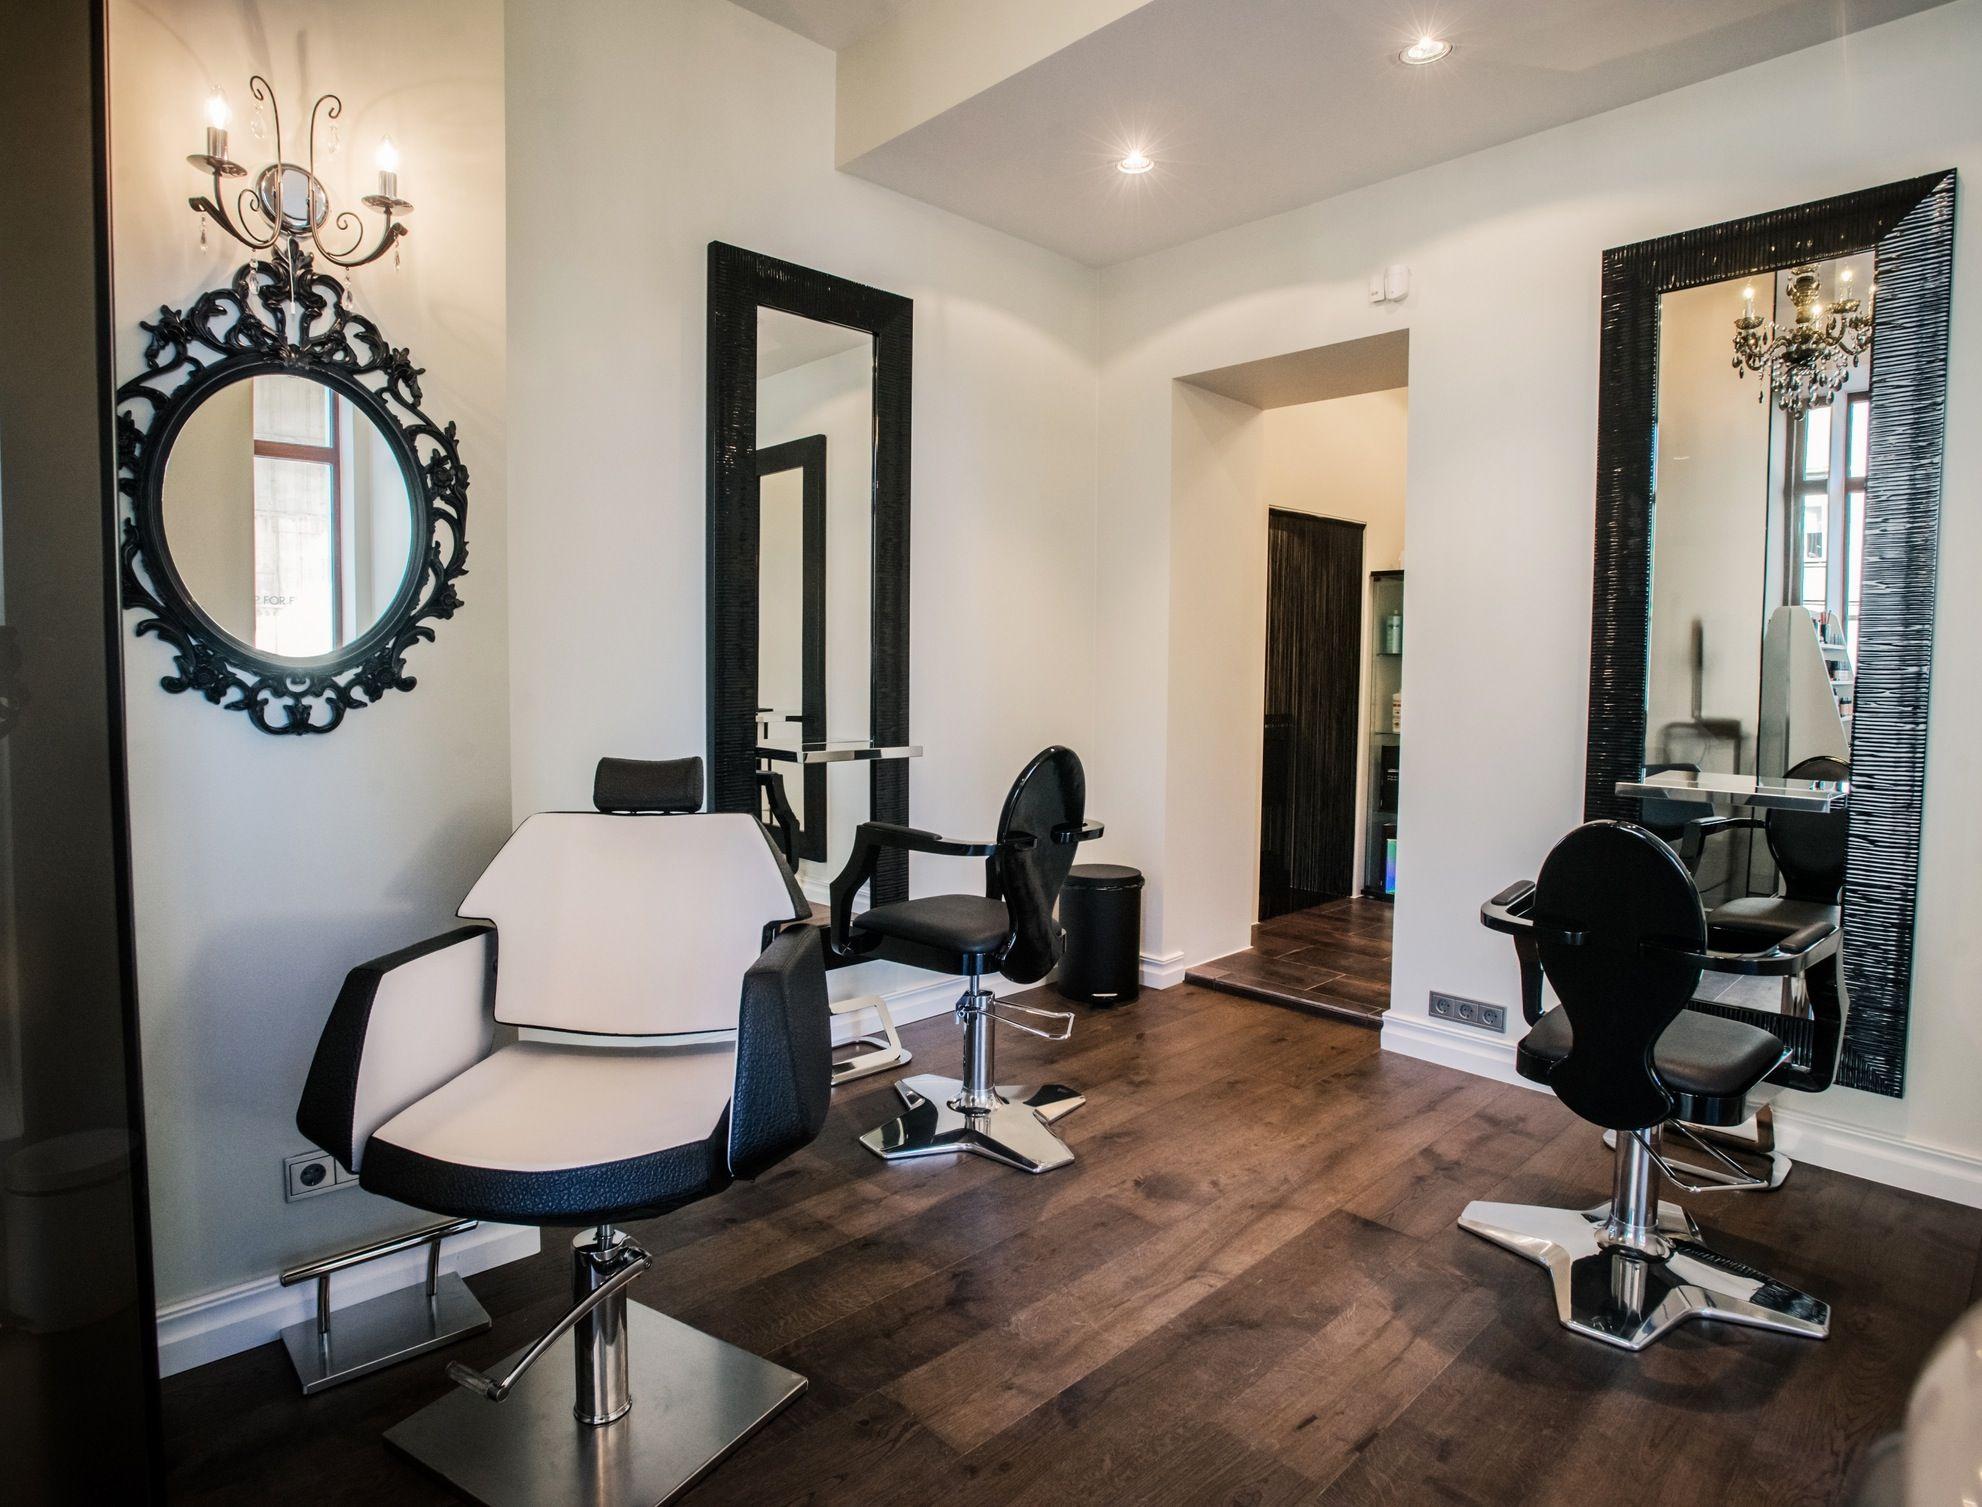 Glow Beauty Studio Kentmanni 10 Tallinn Make up Hair Manicure